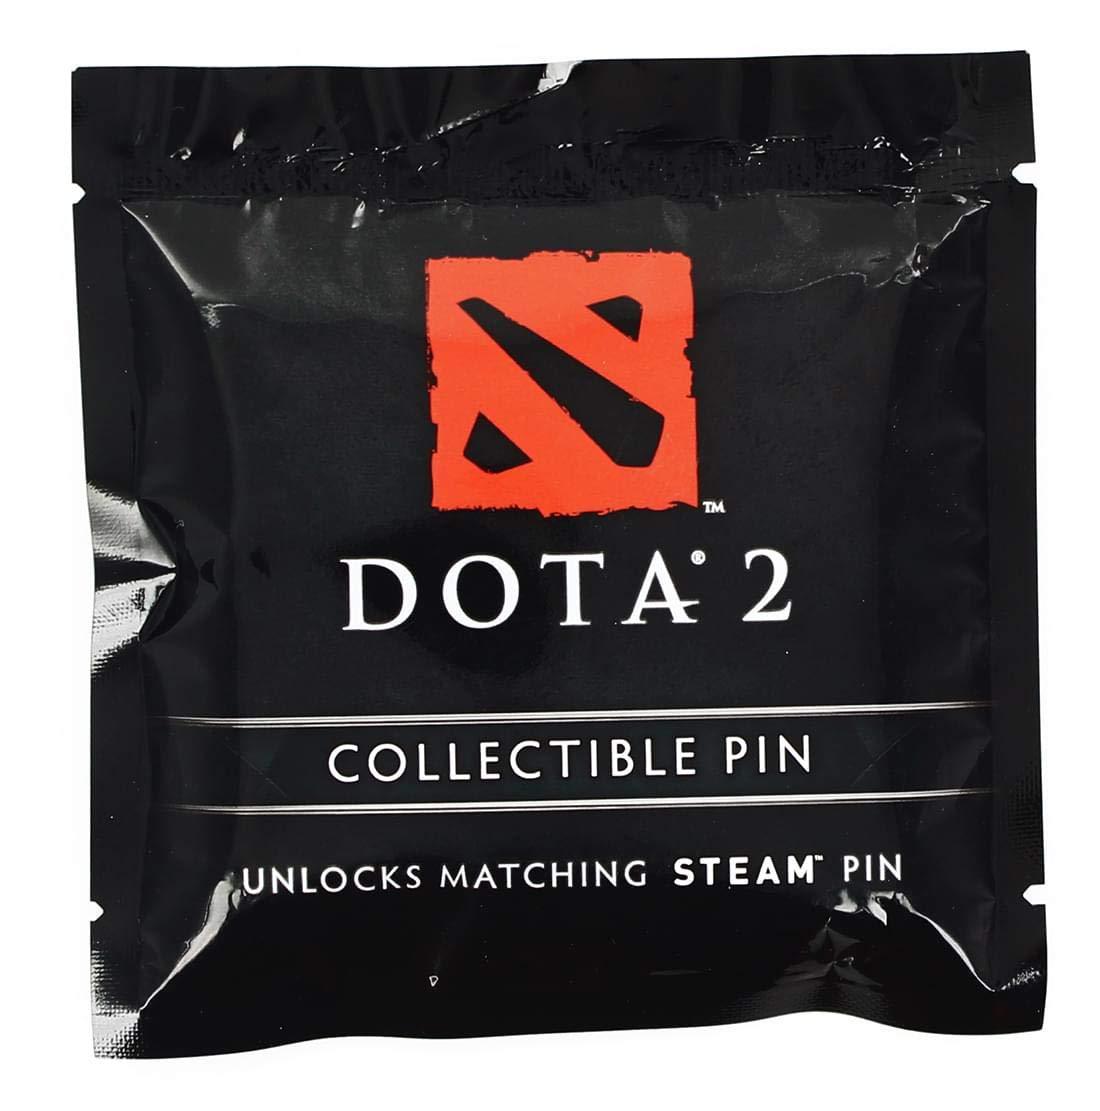 DOTA 2 BLINDBOX COLLECTIBLE PINS (1 Random Pin Sent)